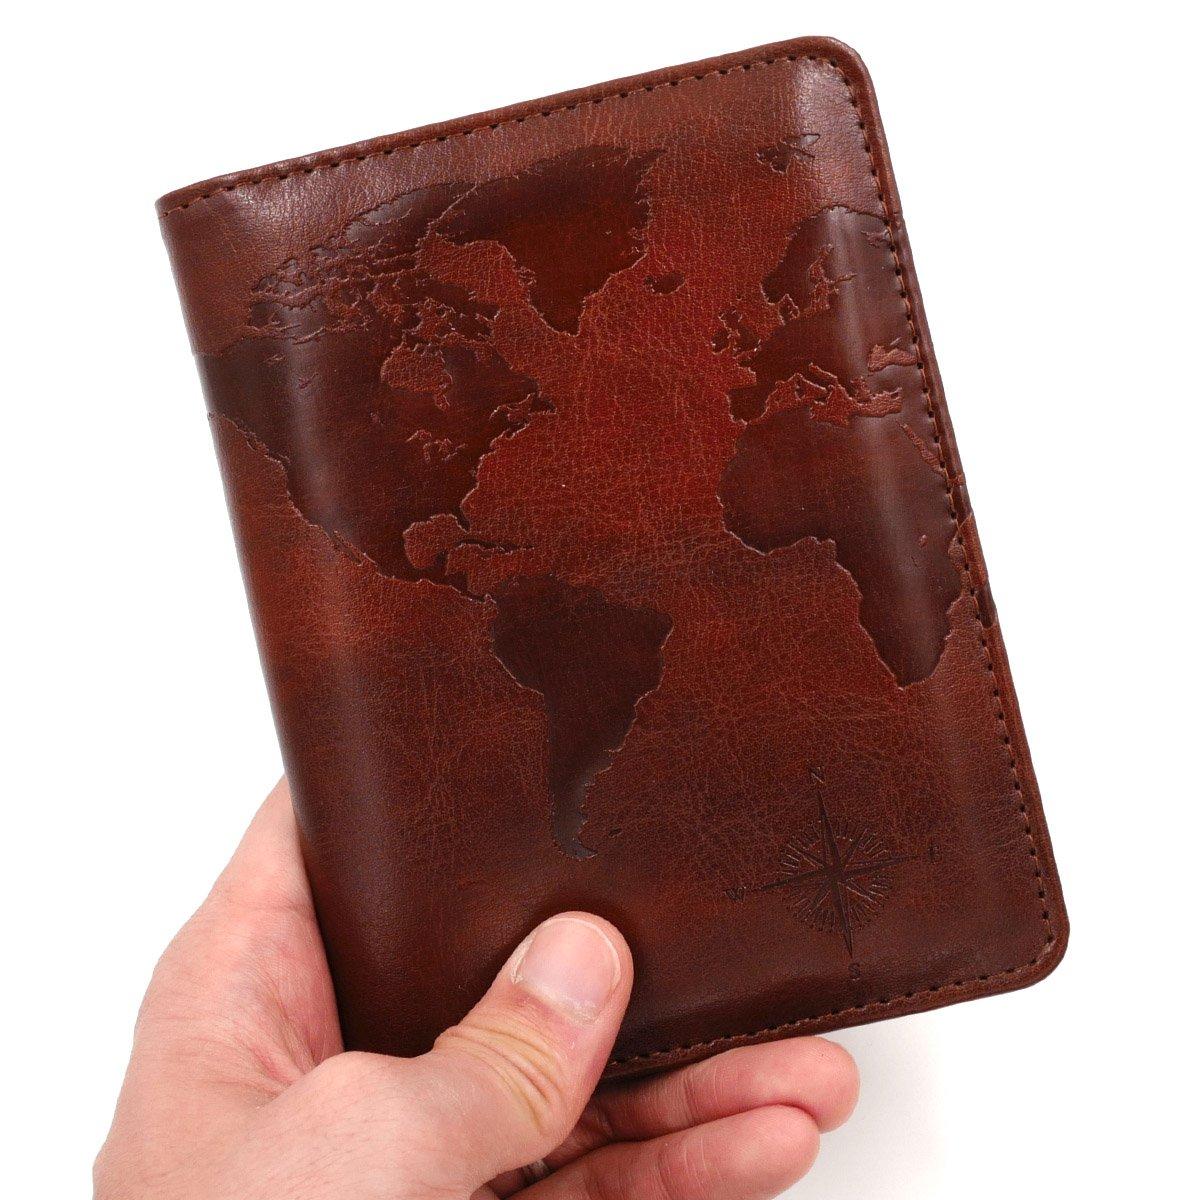 Kandouren RFID Blocking Passport Holder Cover Case,travel luggage passport wallet made with Brown Map Crazy Horse PU Leather for Men & Women